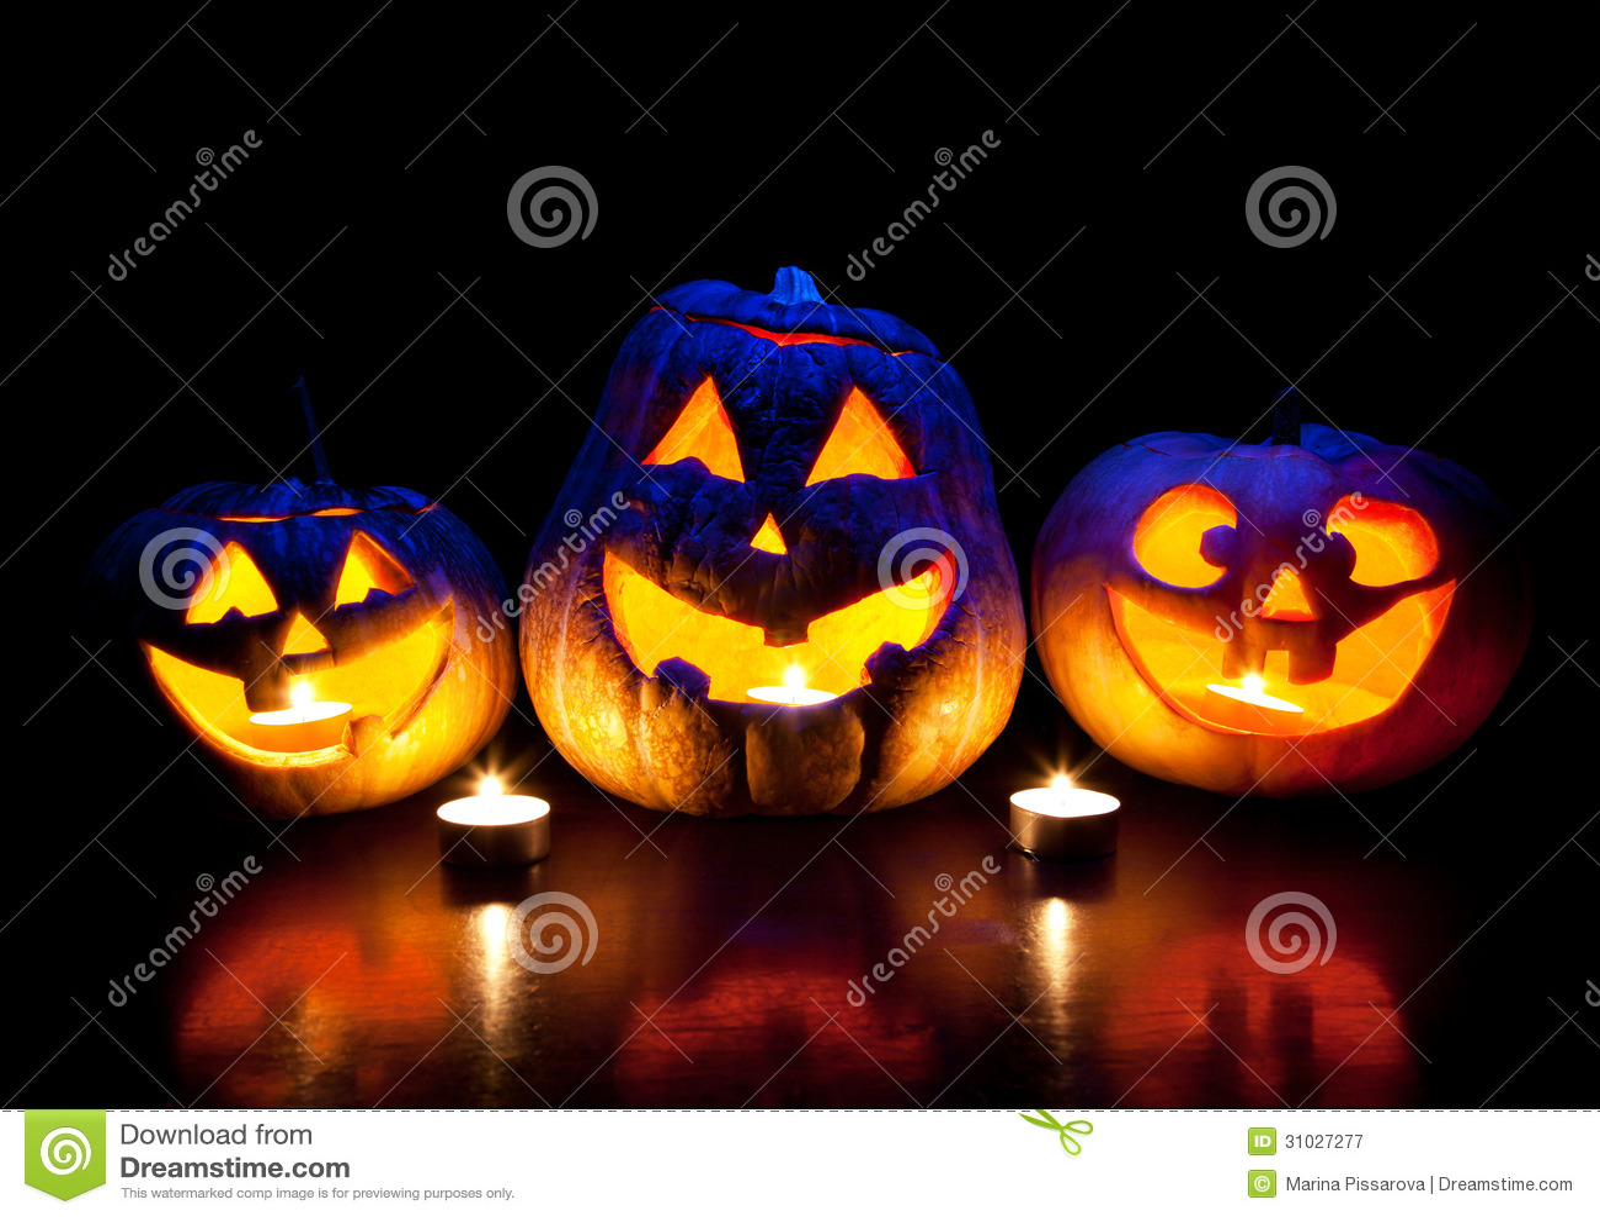 Calabazas de Halloween que brillan intensamente dentro